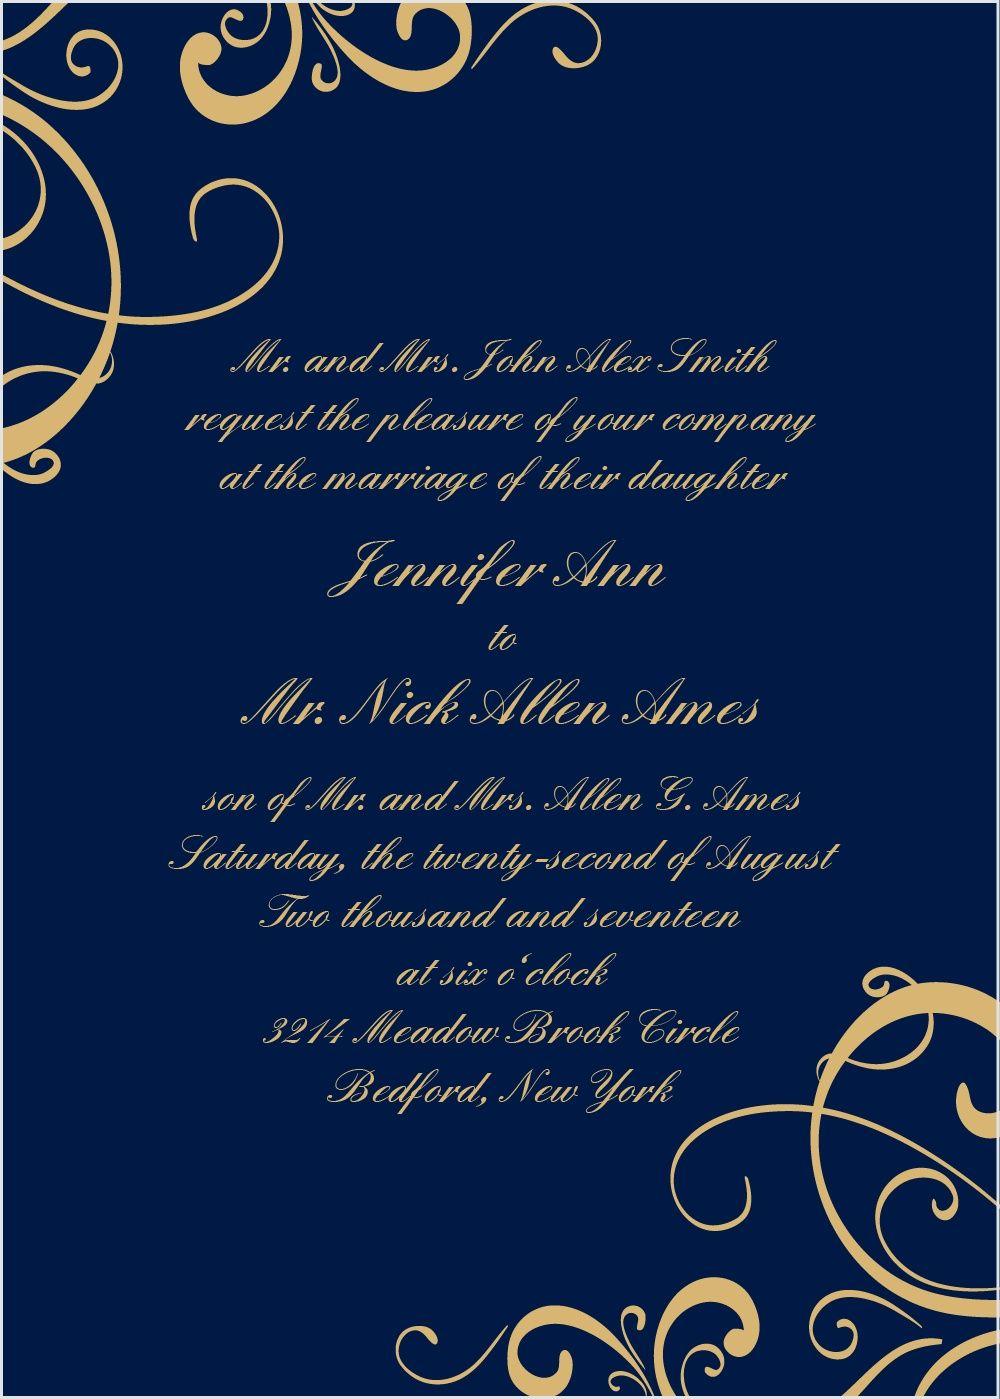 Vintage wedding decorations ideas november 2018 Simple Swirls Foil Wedding Invitation  wedding   Pinterest